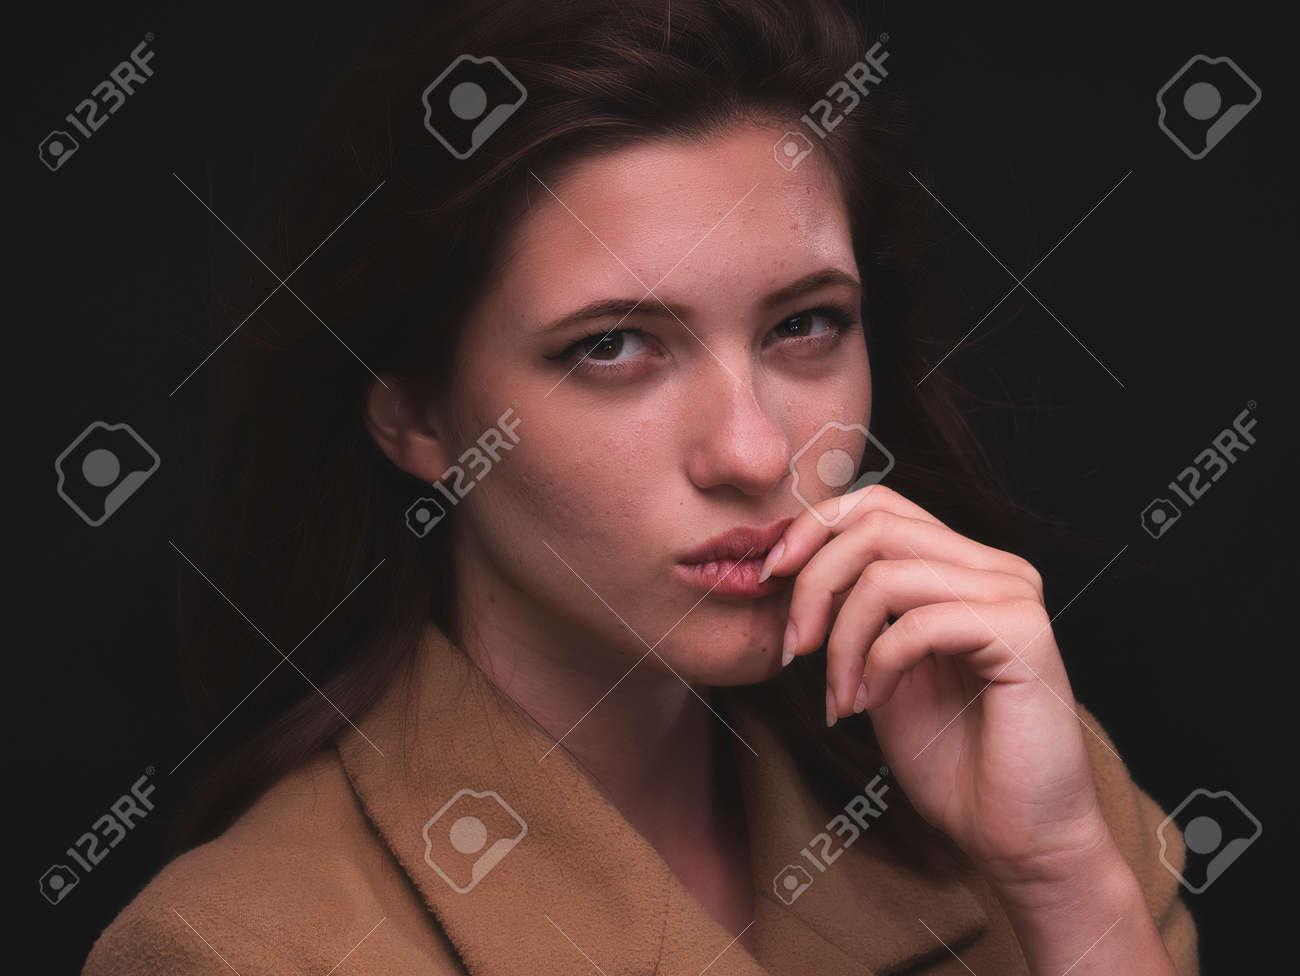 high key. Conceptual portrait with plastic sheets. One young woman strugling with plastic sheets. - 164118913